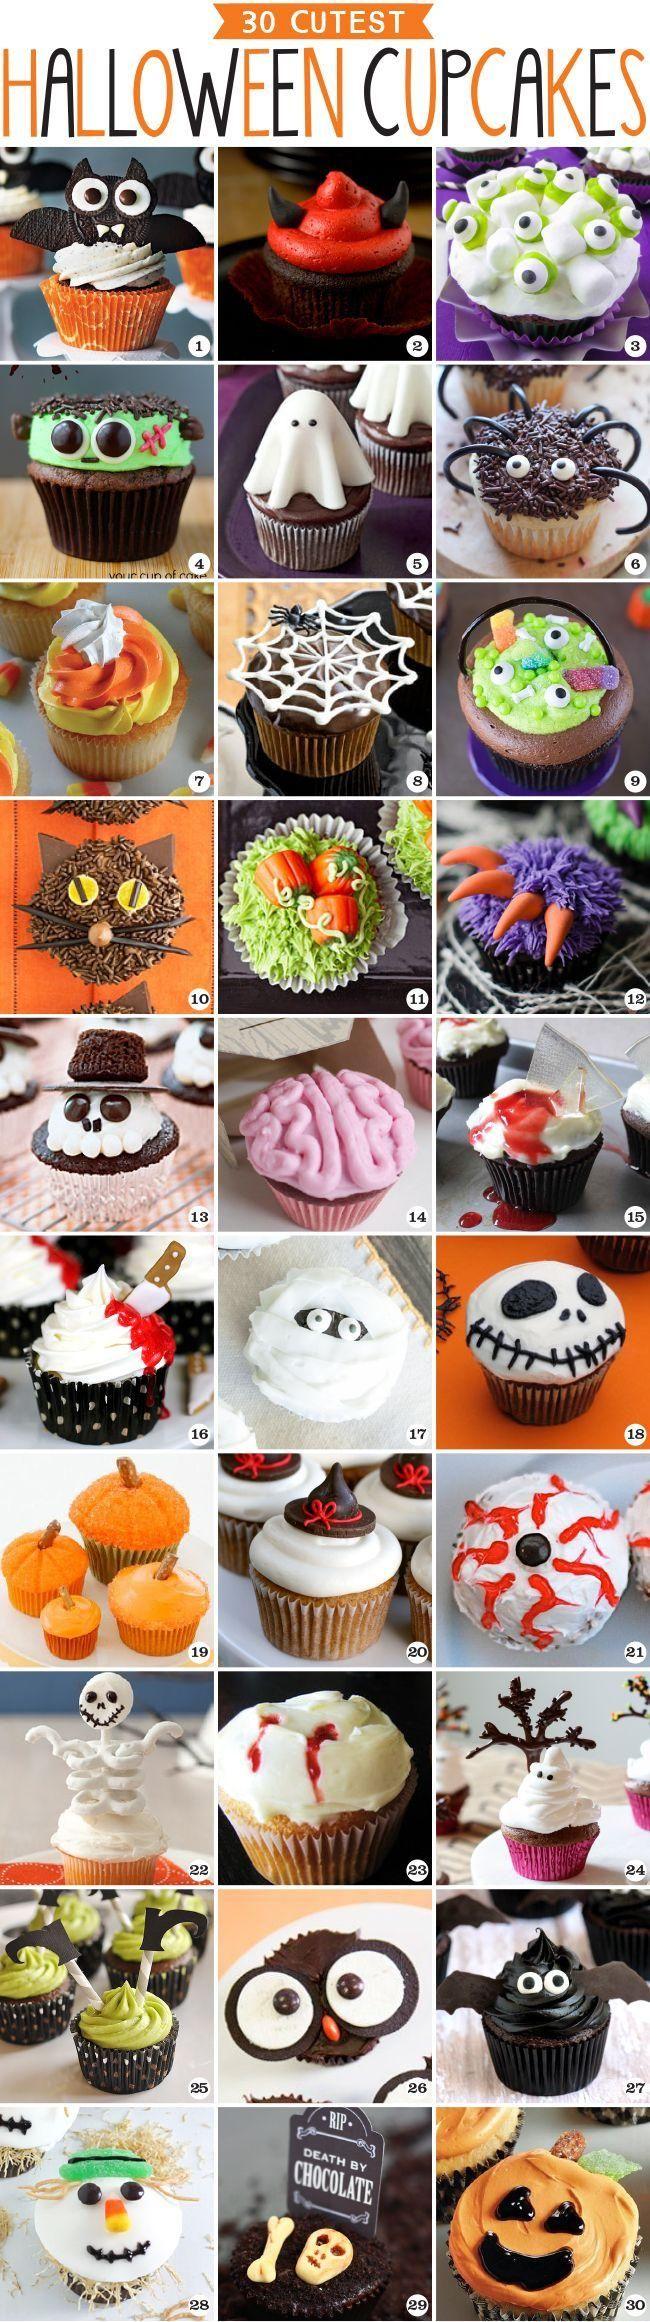 Halloween First Birthday Halloween Party Ideas | Halloween parties ...